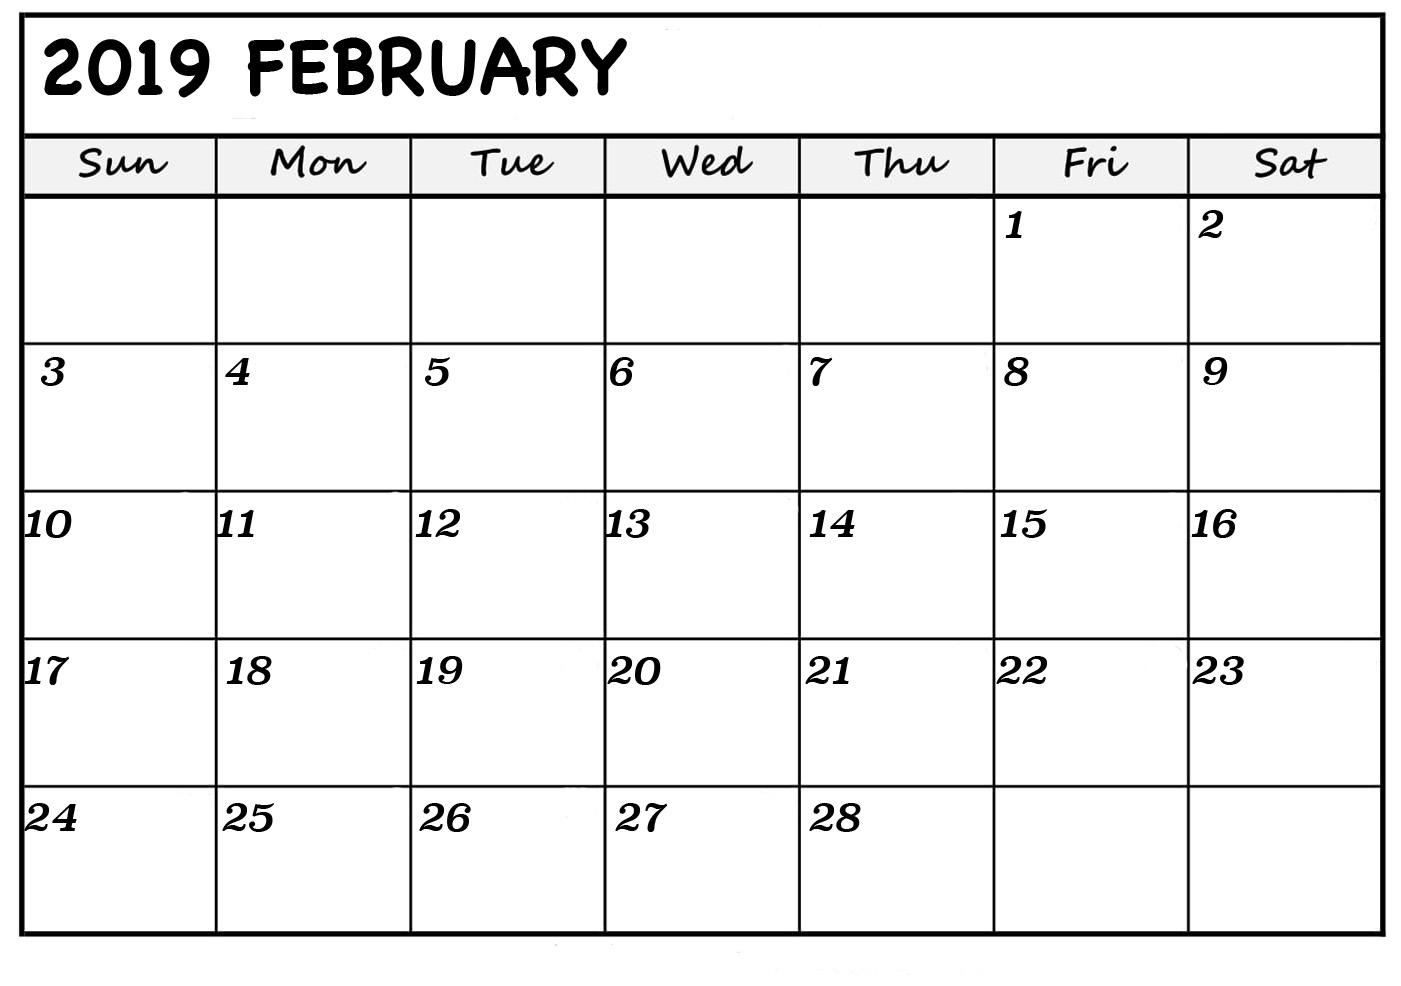 February Calendar 2019 India